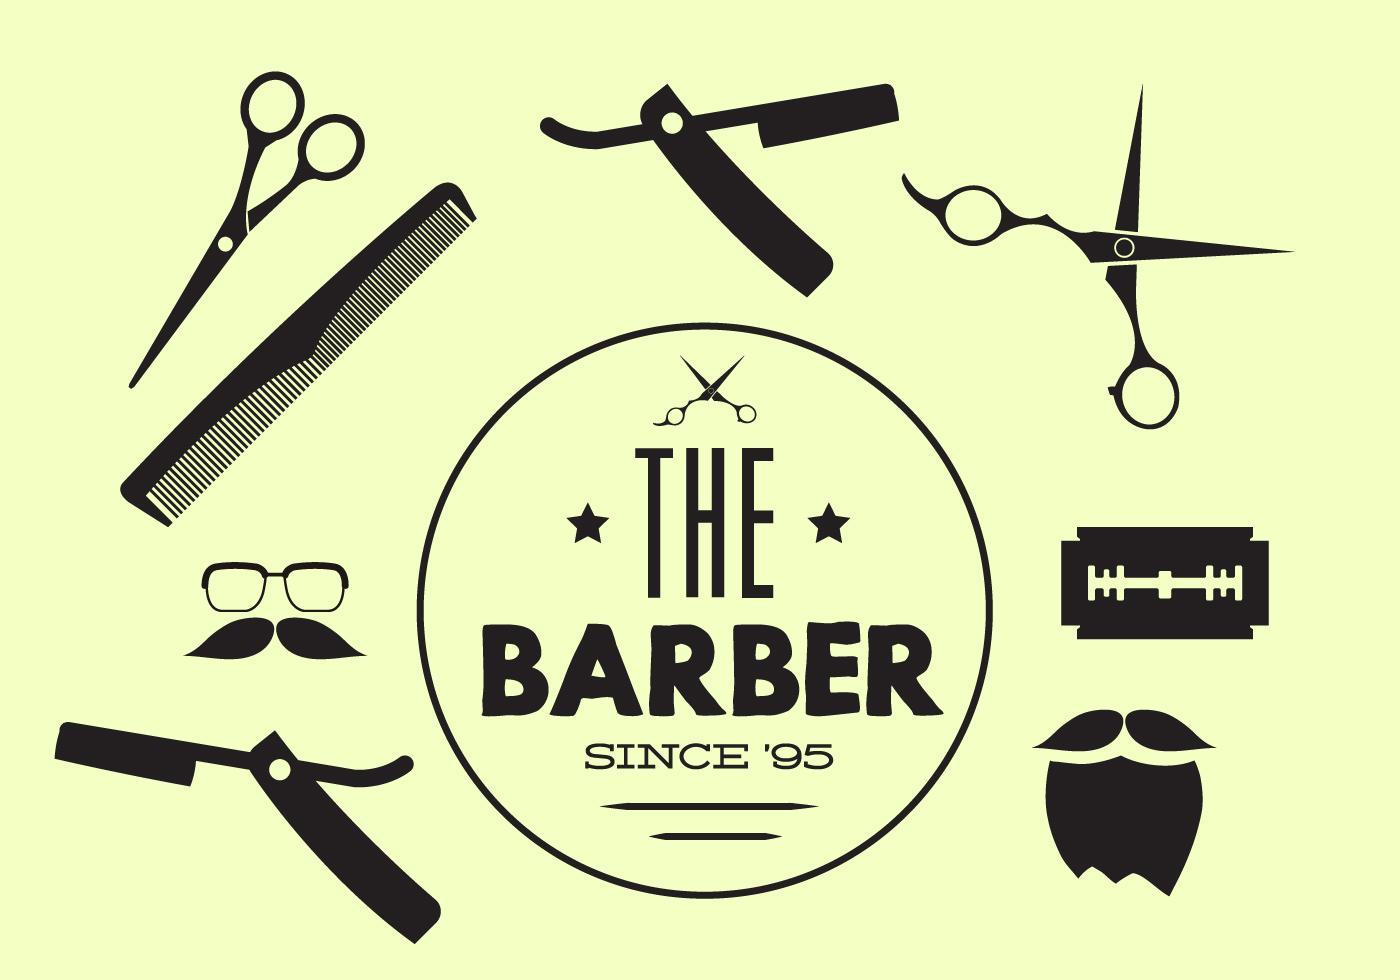 barber logo download - HD1400×980